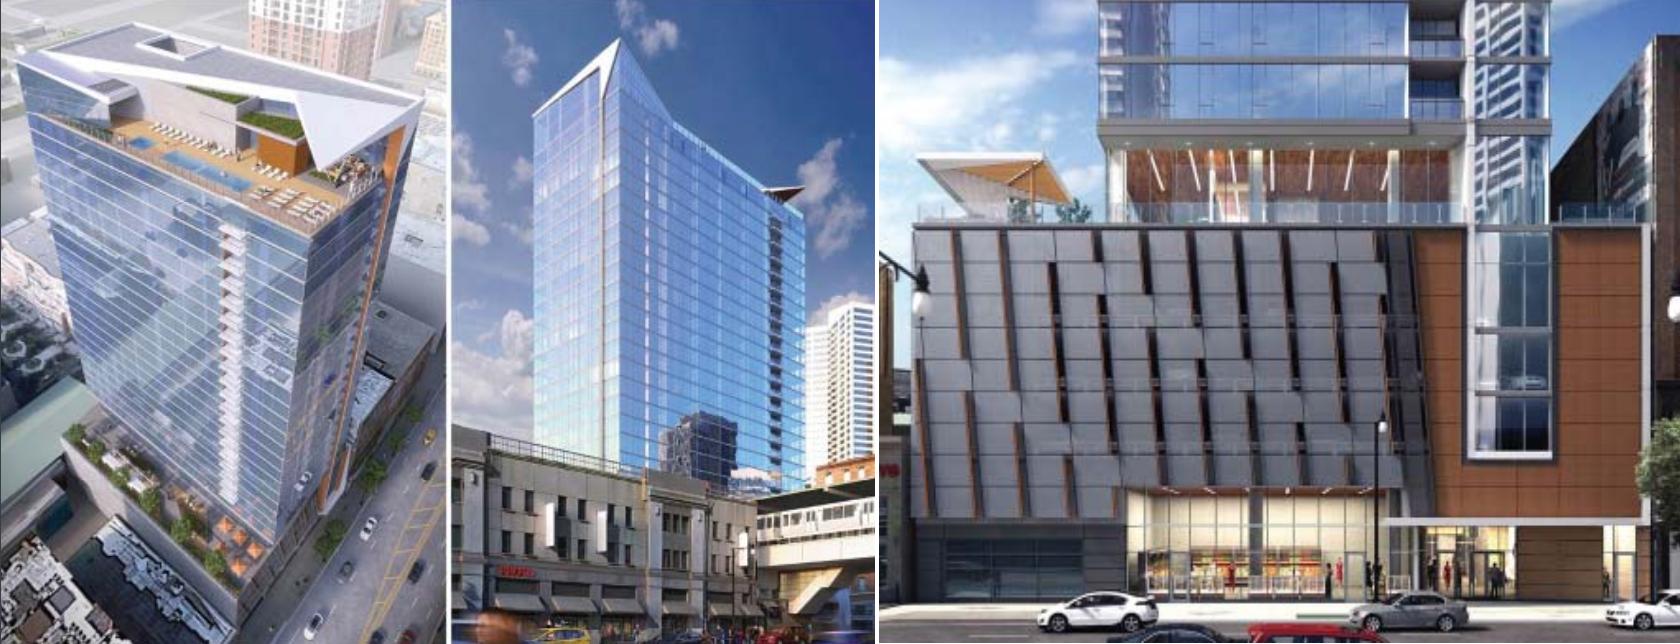 Construction Kicks Off On South Loop Tower Near Roosevelt